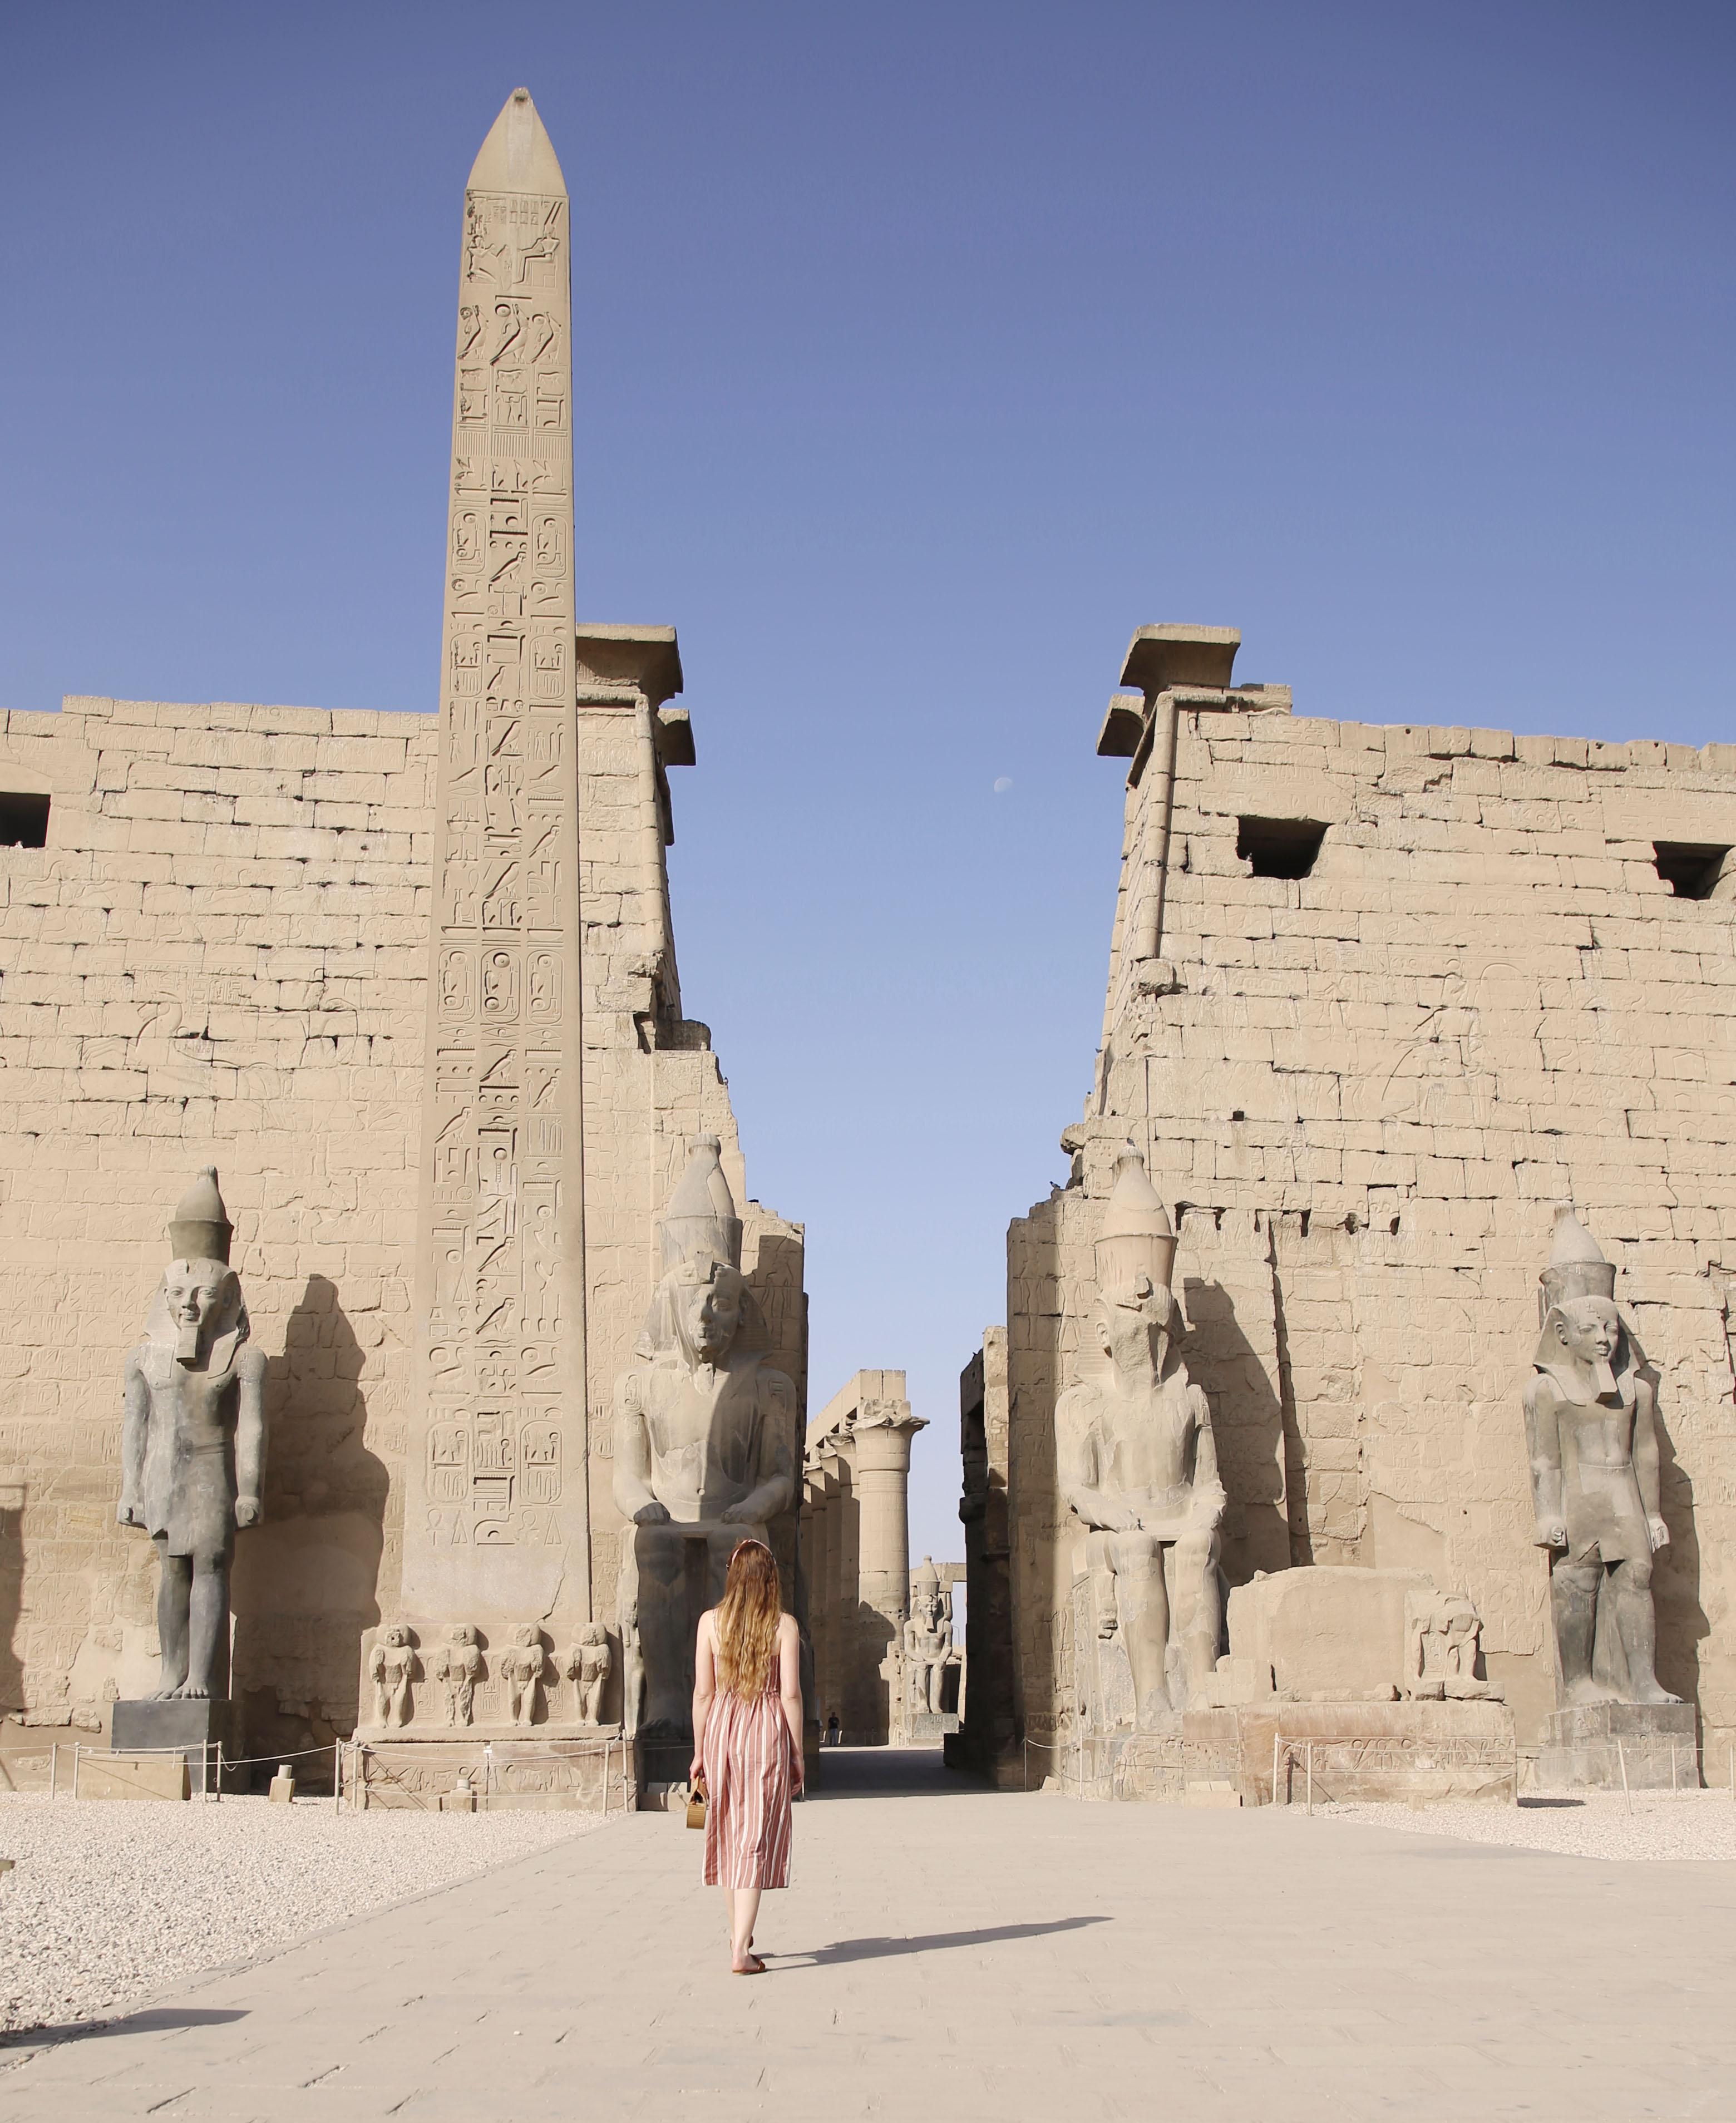 mia und ich blog Luxor Obelisk Tempel  Ägypten Egypt Pylon